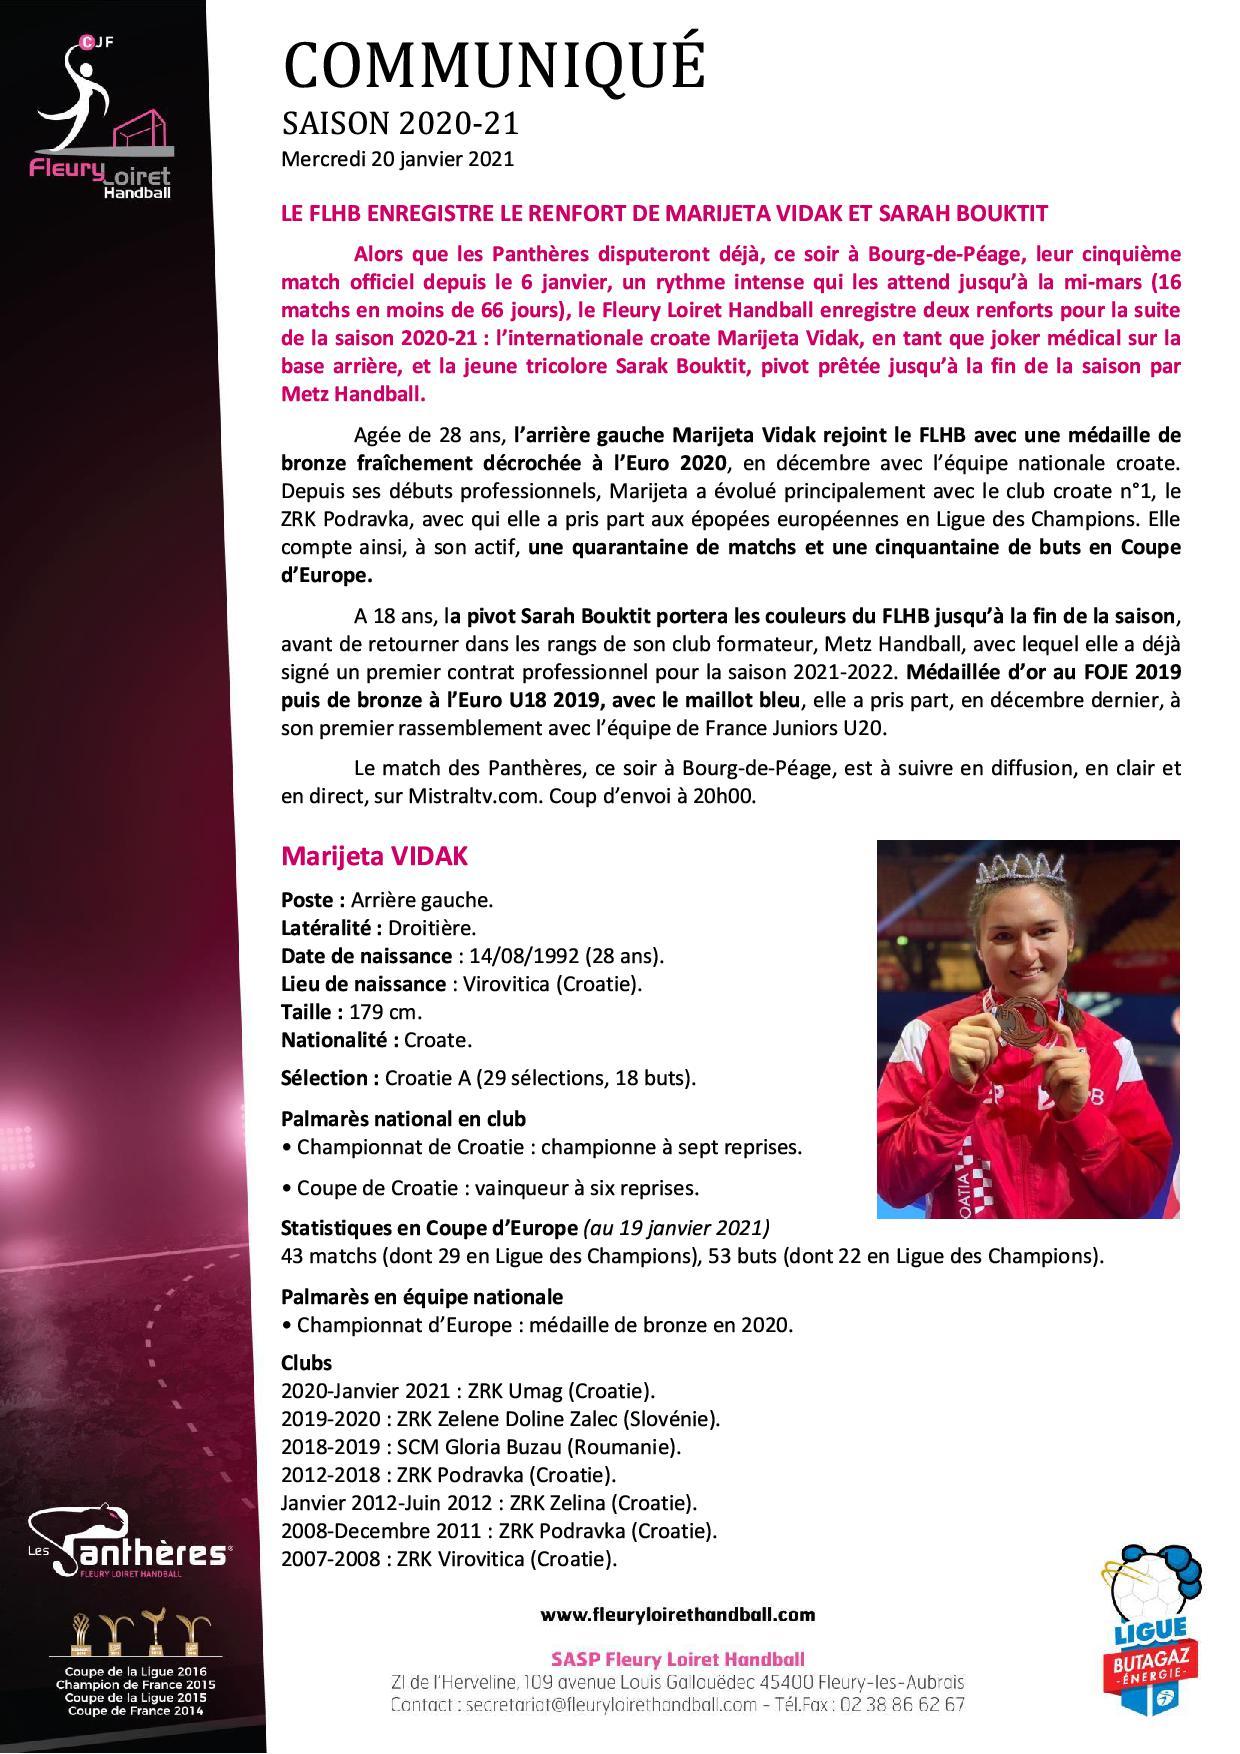 Communiqué Fleury Loiret Handball - Mercredi 20 janvier 2021 N° 21.jpg